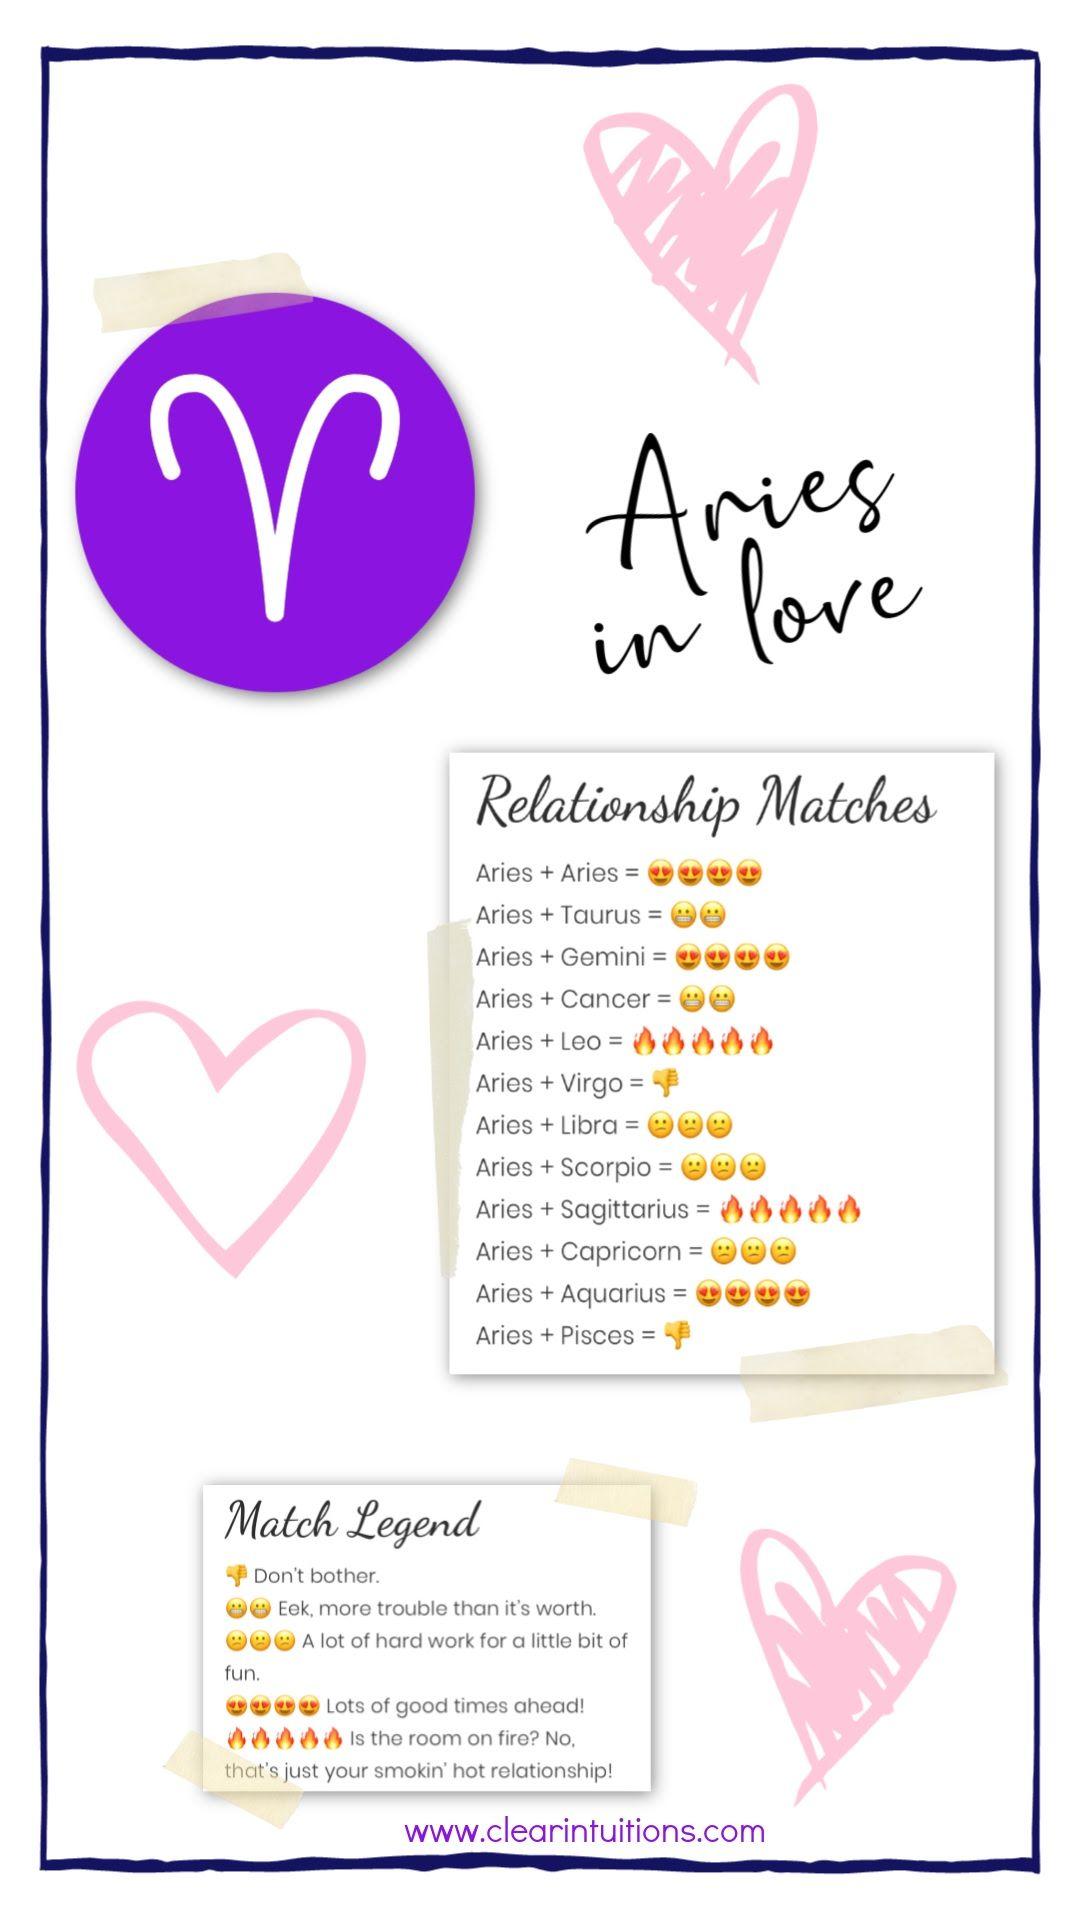 Aries in Love in 2020 | Virgo and sagittarius, Aries and